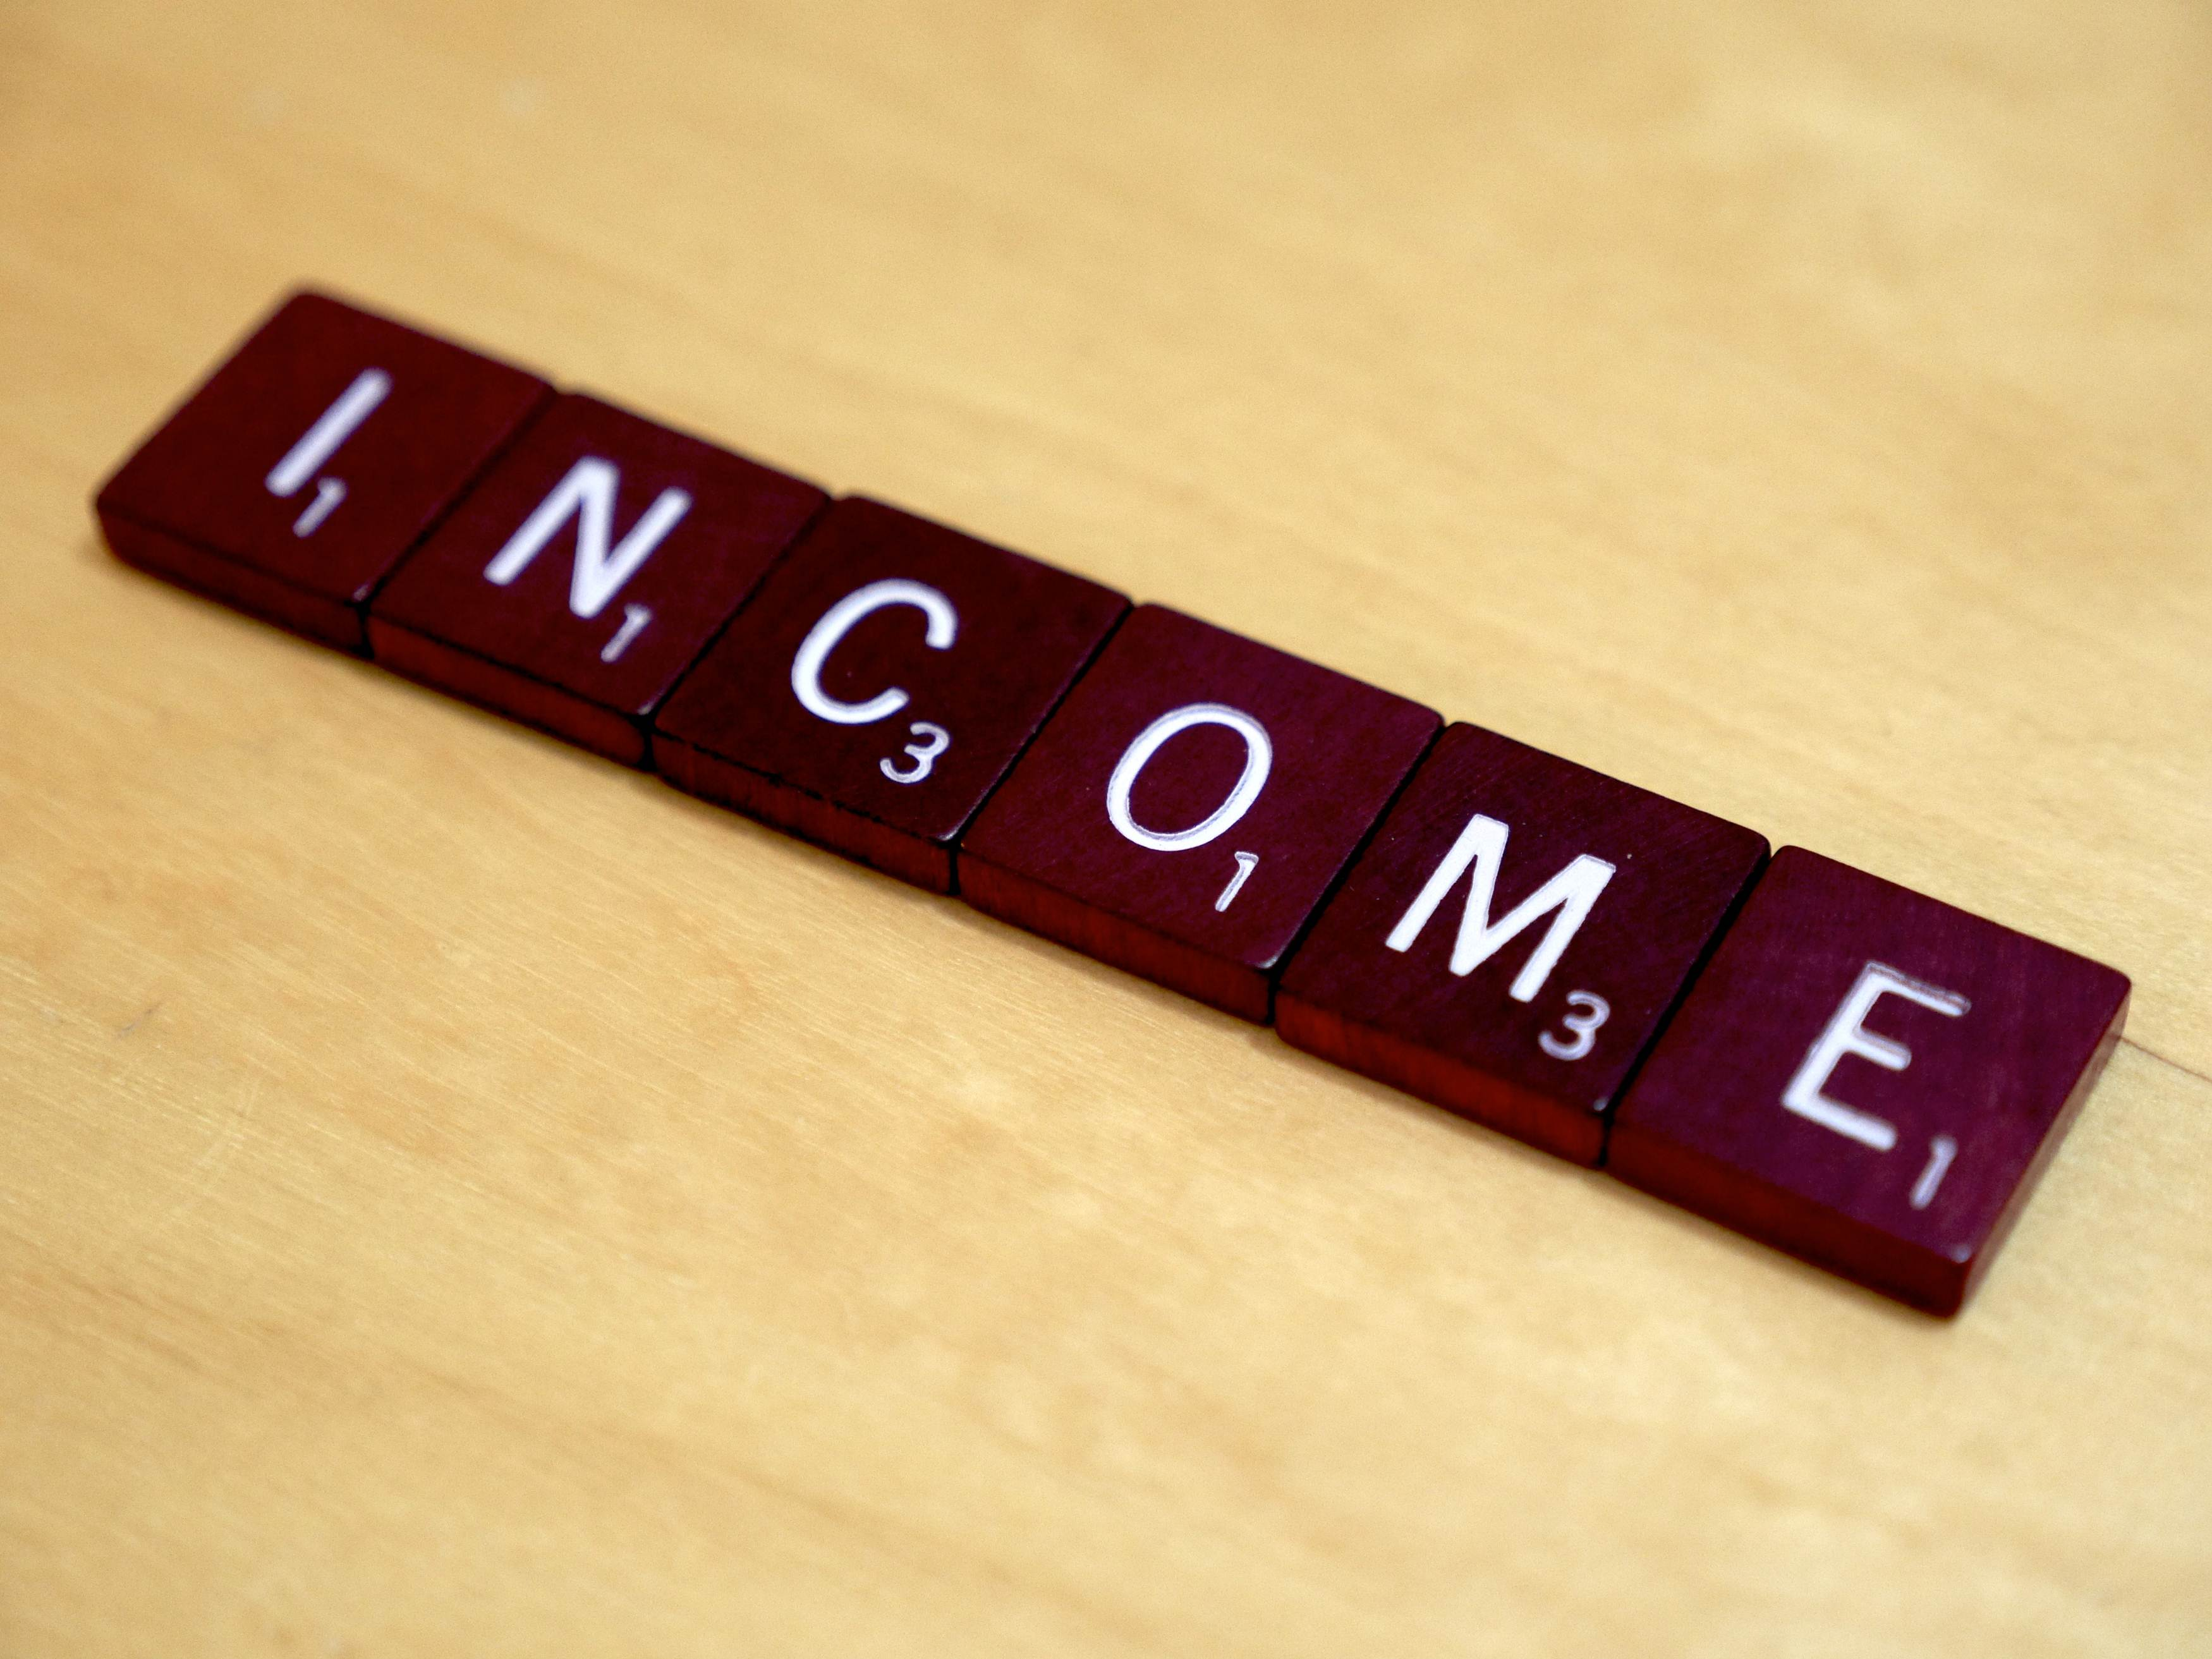 Jana pendapatan online di internet Malaysia